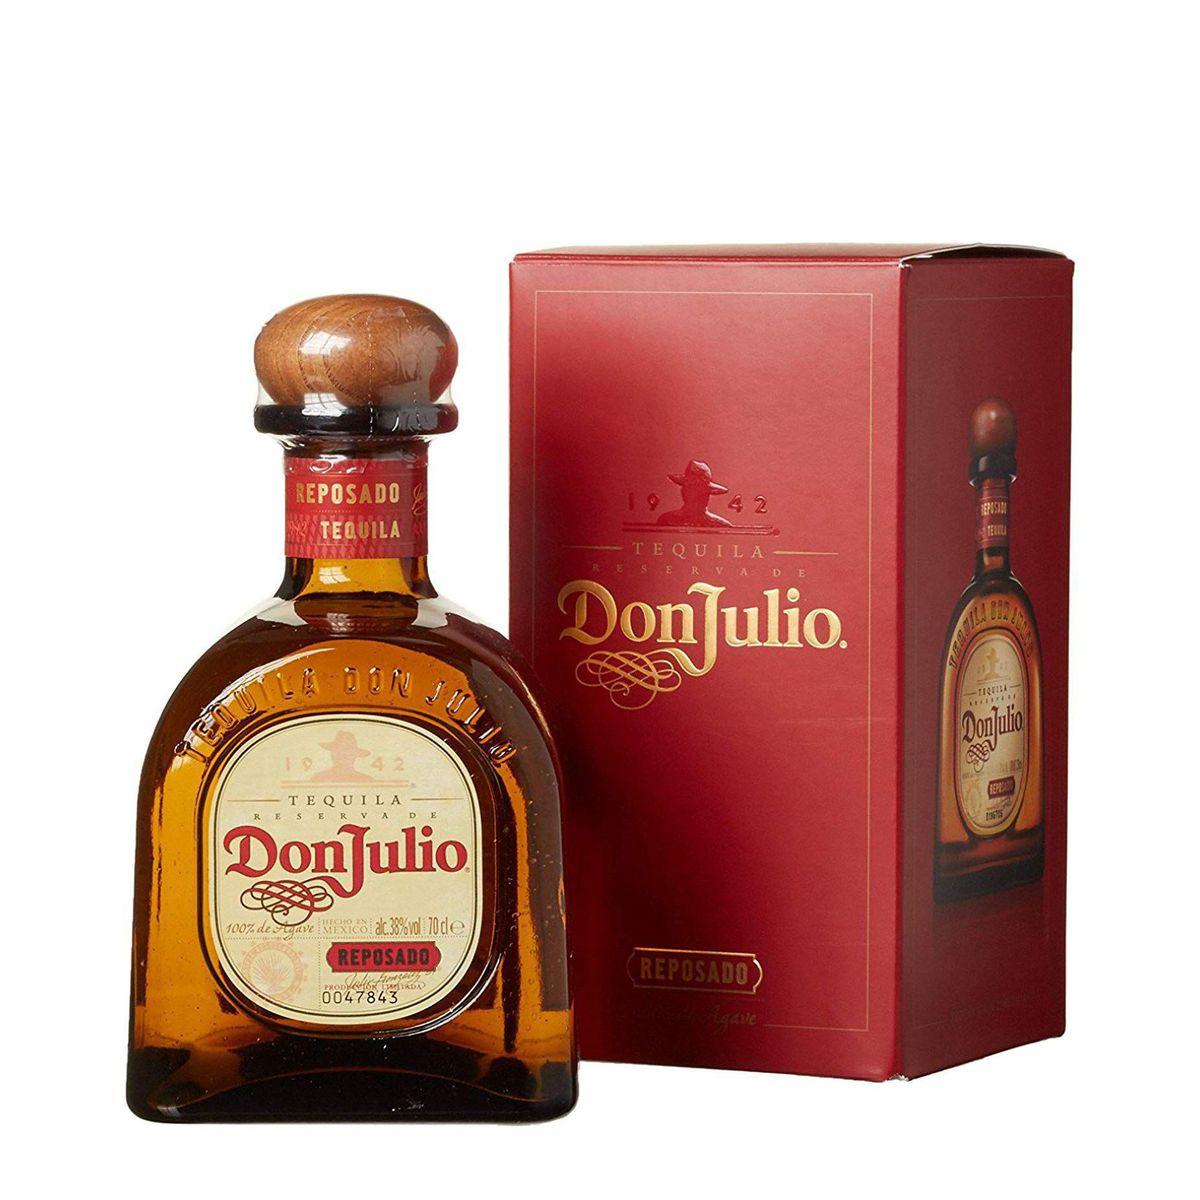 Reposado Tequila Don Julio